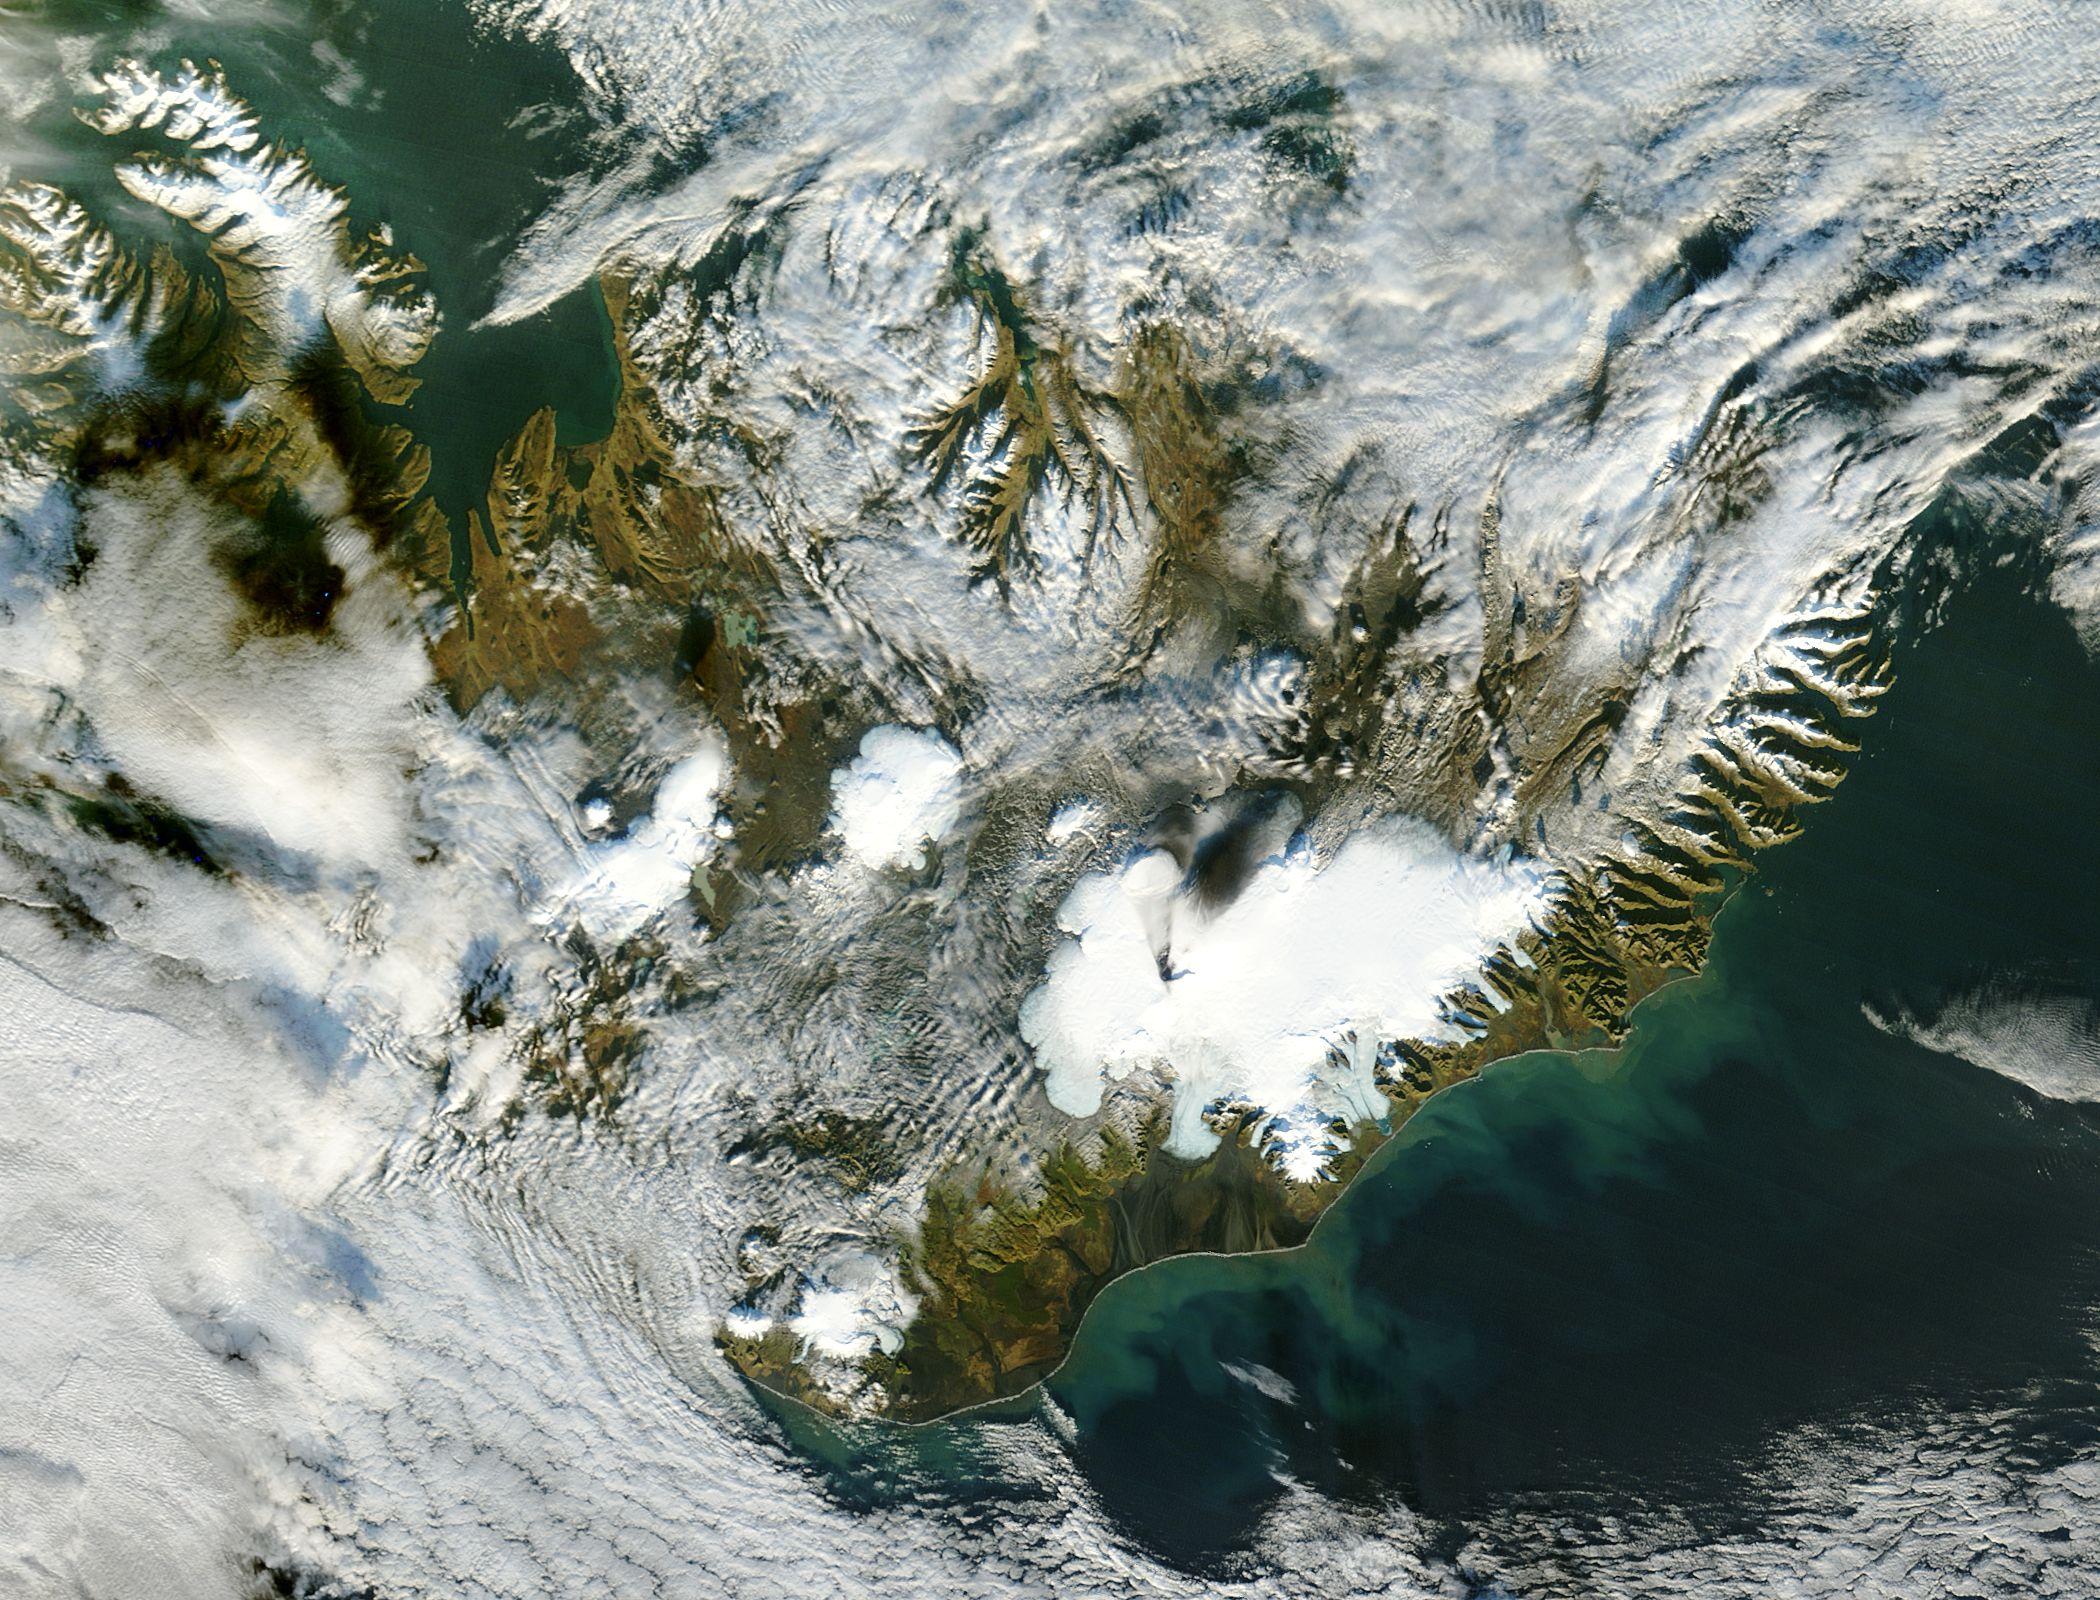 Ceniza del  volcán Grímsvötn a través de la capa de hielo de Vatnajokull